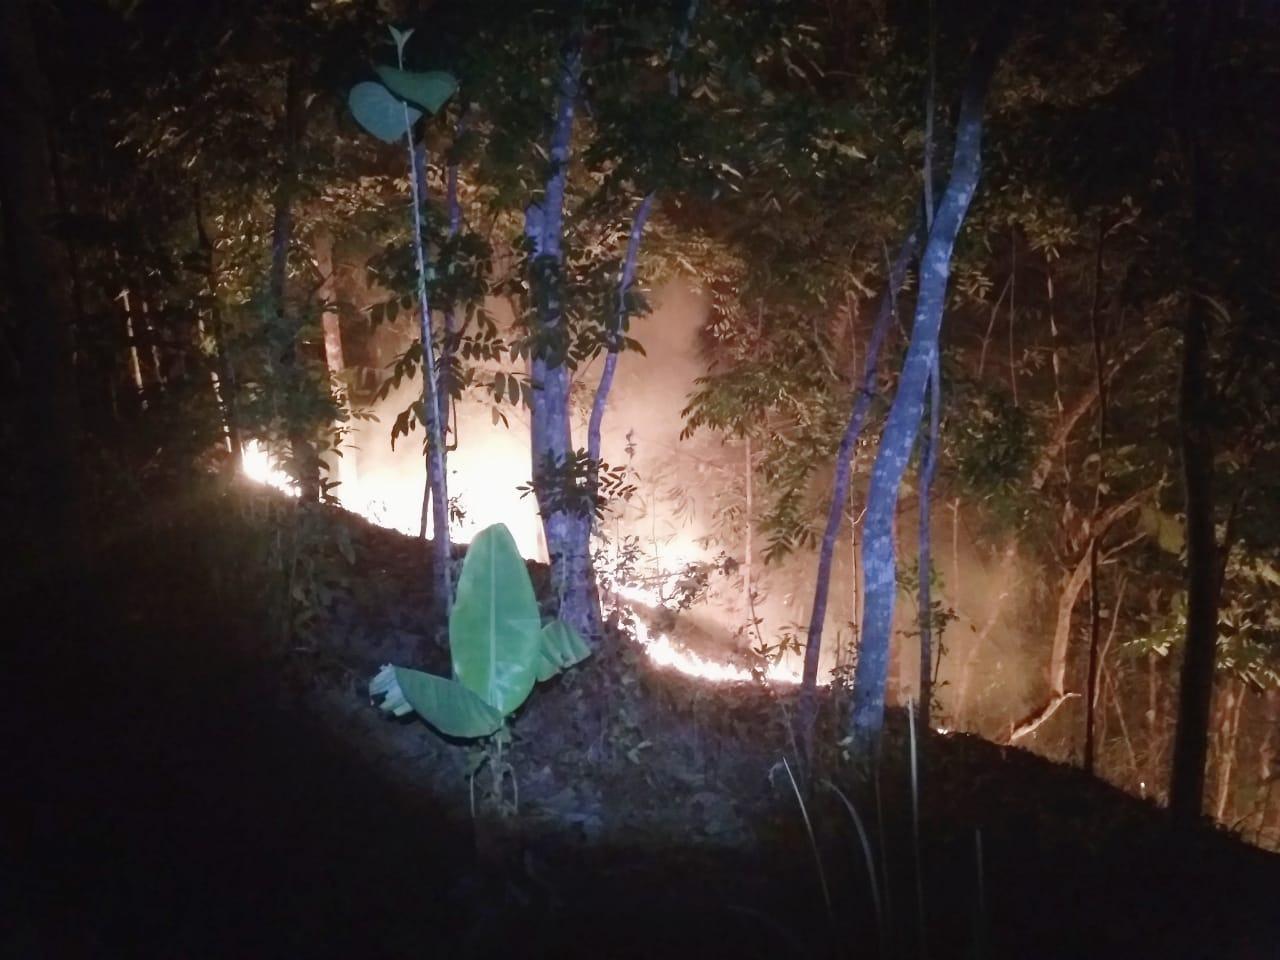 Kebakaran Banjar, 5 Hektare Lahan Milik Warga Dilalap Si Jago Merah